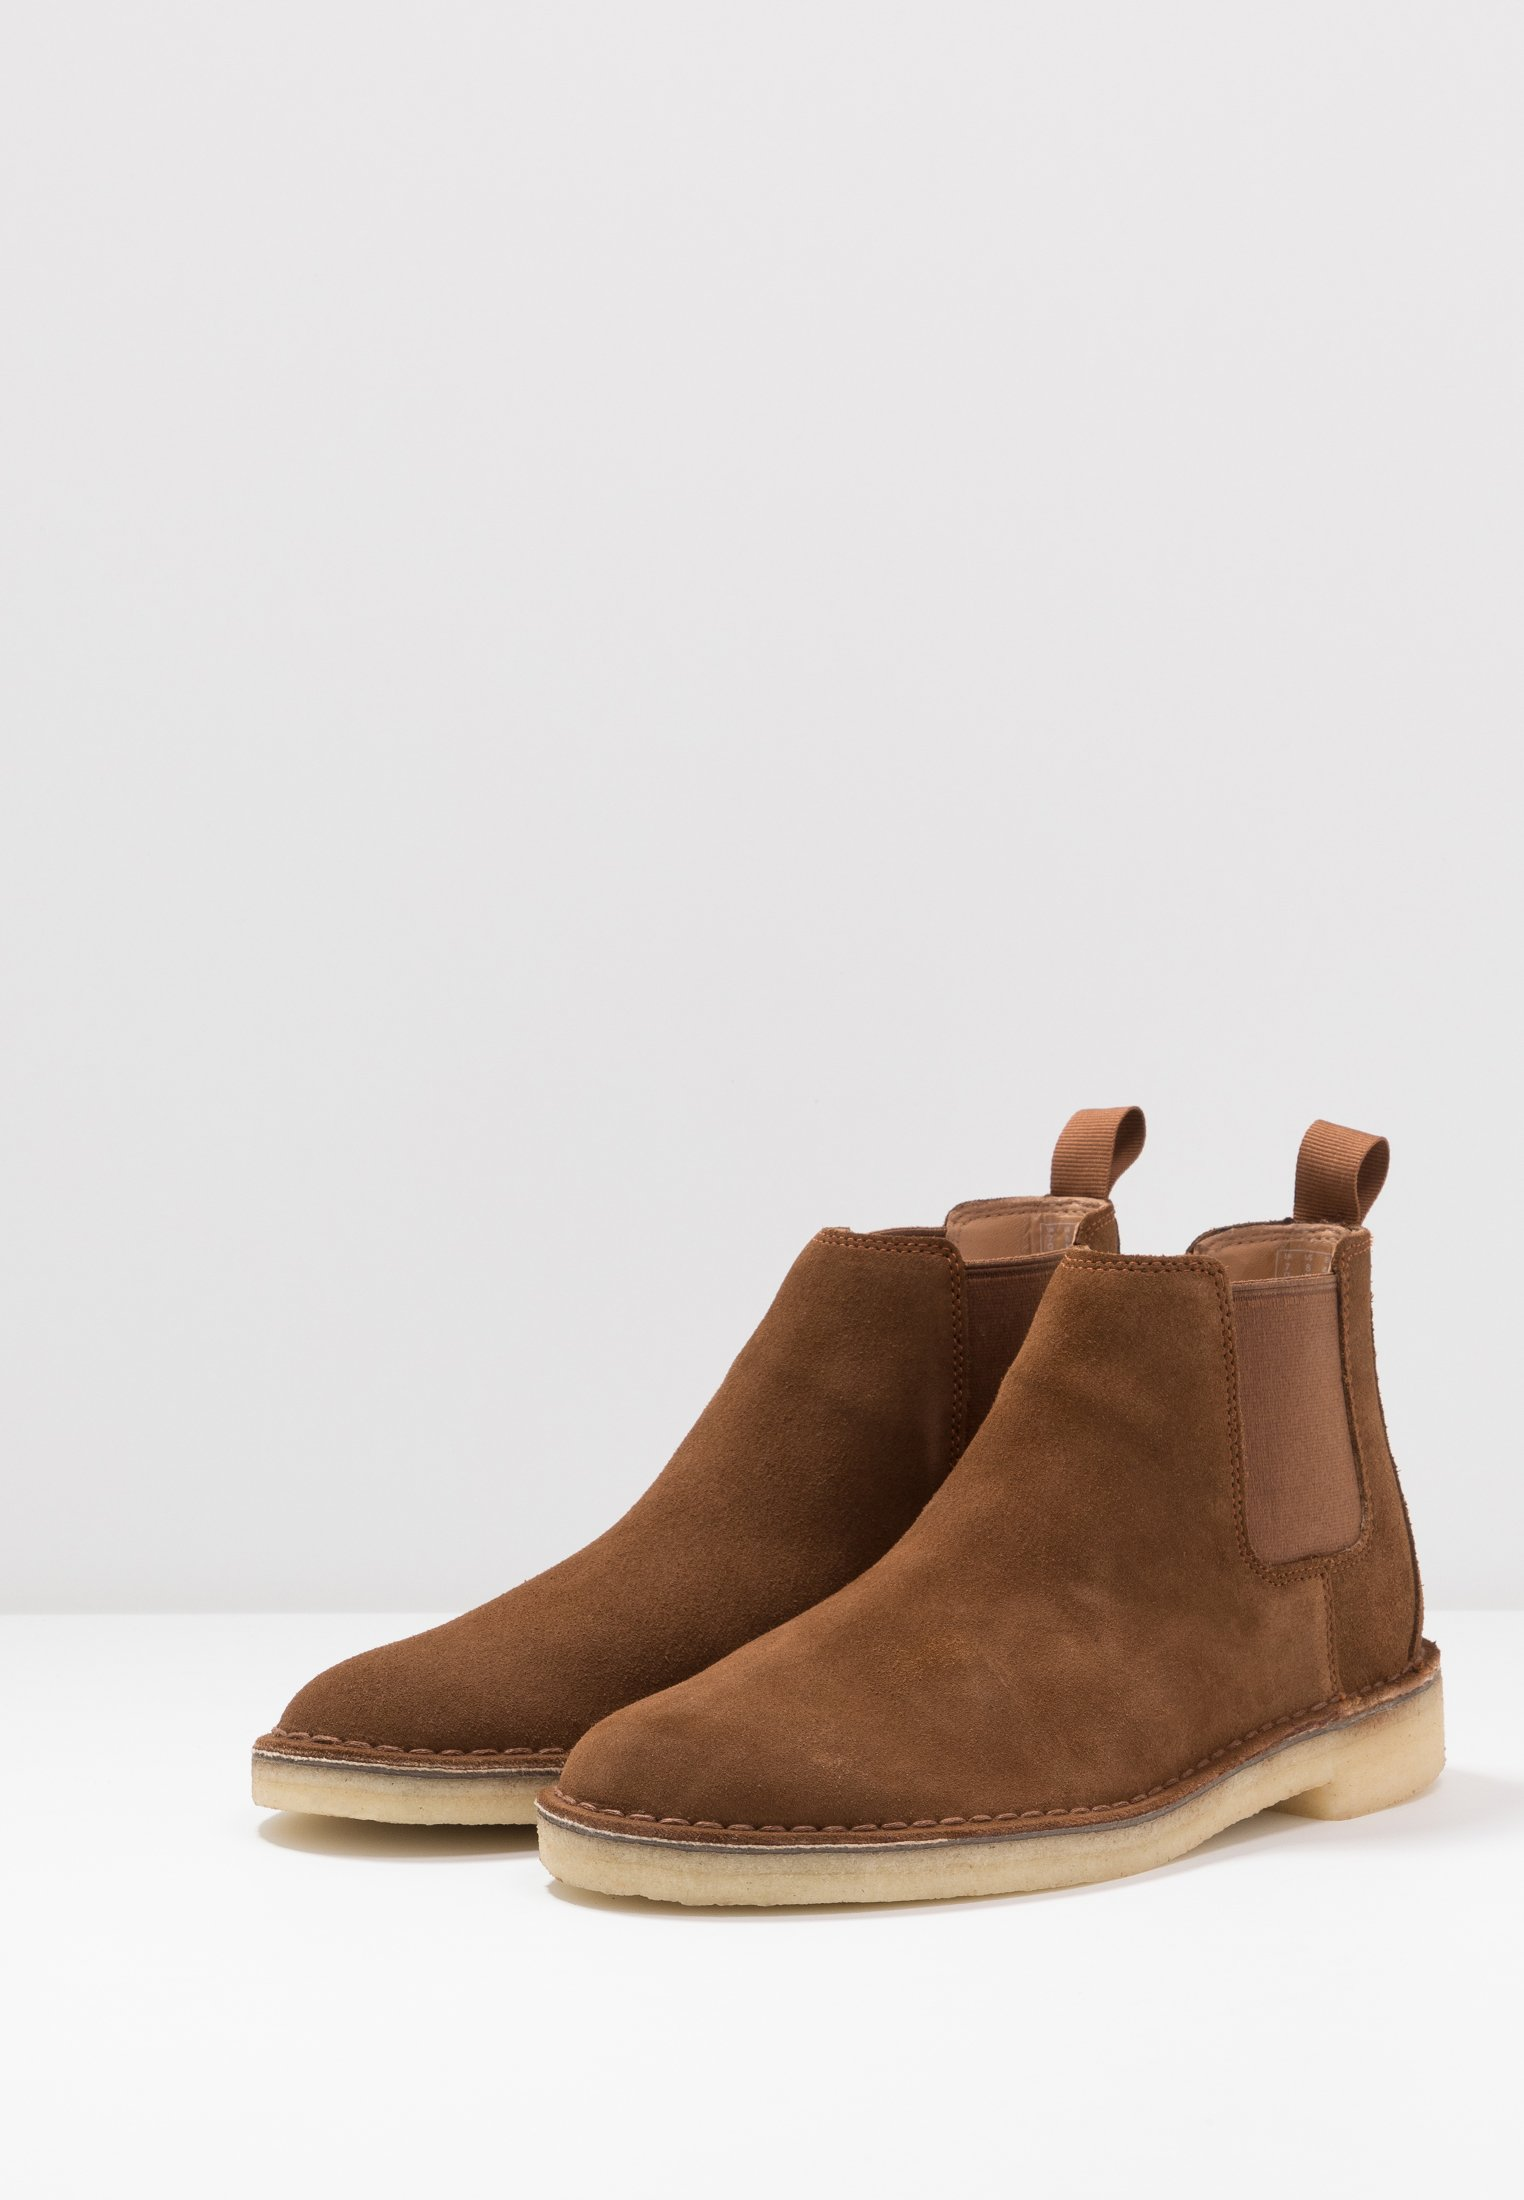 High Quality Cheapest Clarks Originals DESERT CHELSEA - Classic ankle boots - cola | men's shoes 2020 NBJuH